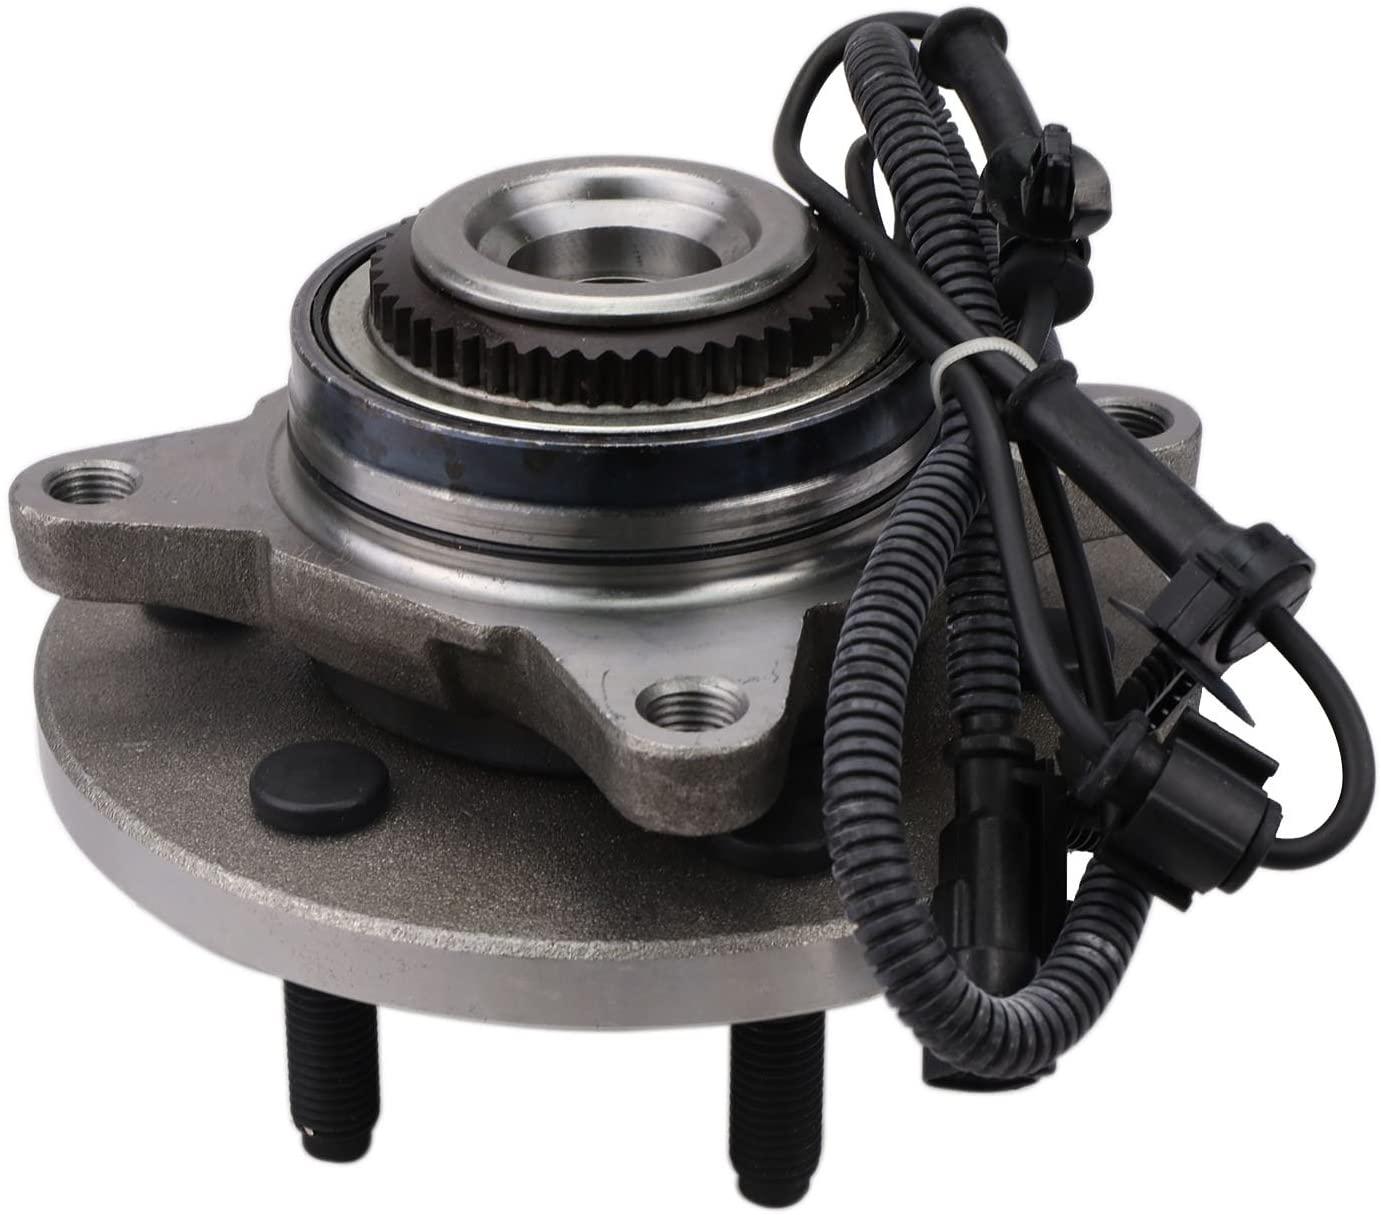 Bodeman - Front Wheel Hub & Bearing Assembly for 2011 2012 2013 2014 Ford F-150 SVT Raptor - 4WD